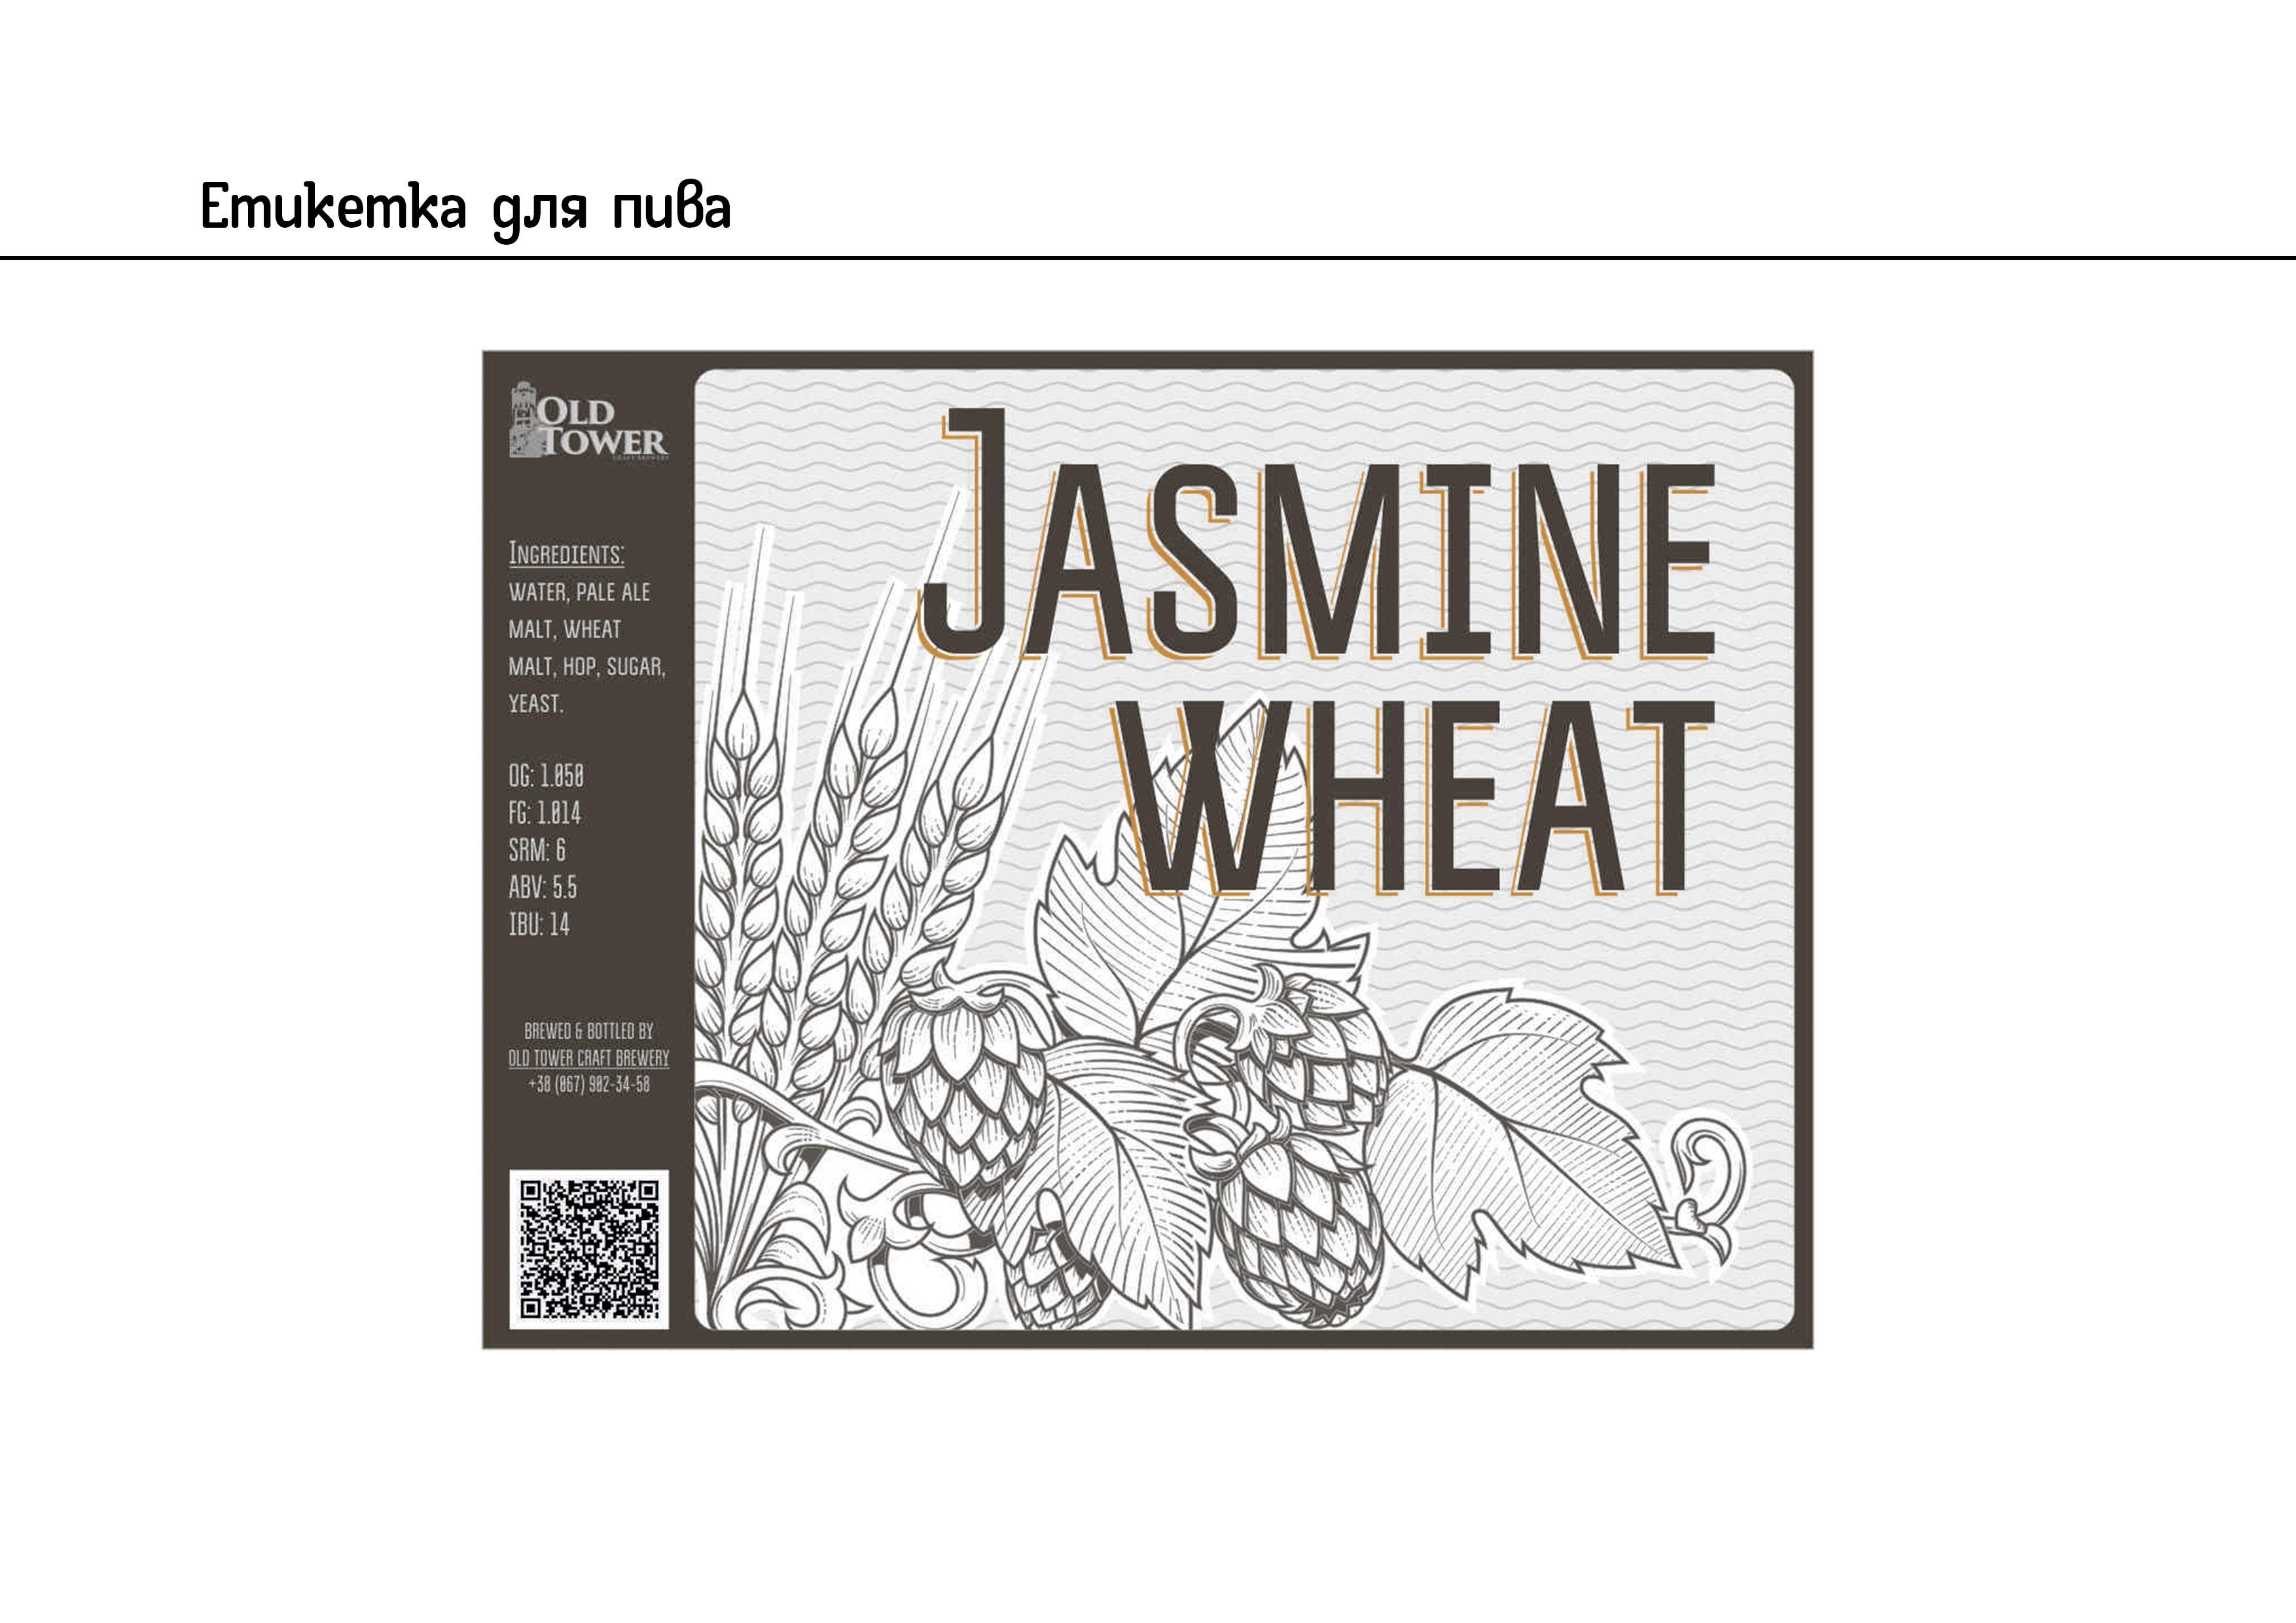 Фото Етикетка на пляшку пива